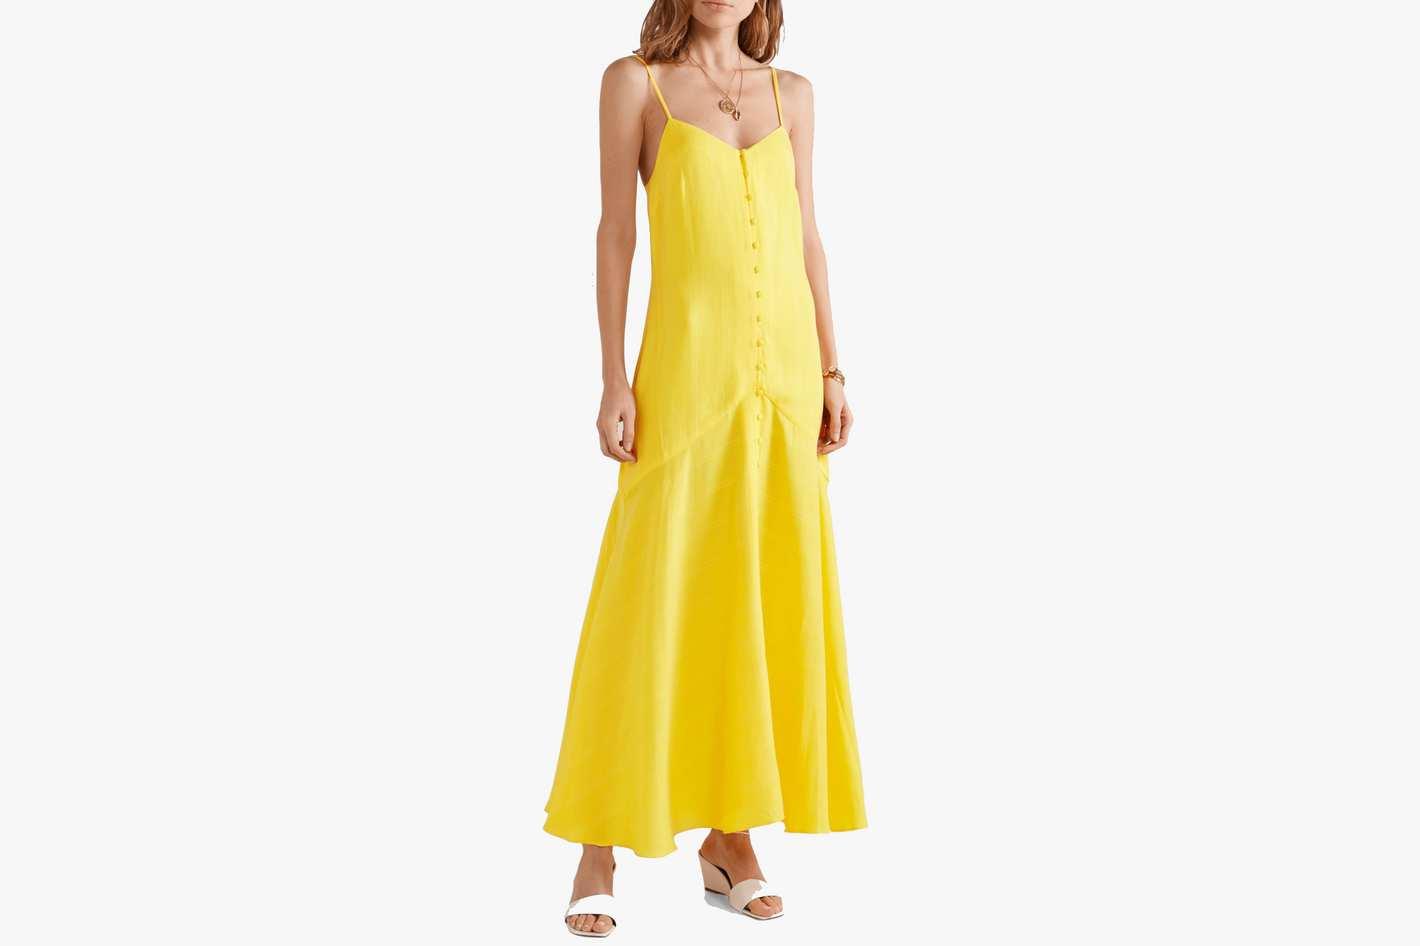 Mara Hoffman Diana Tencel Maxi Dress